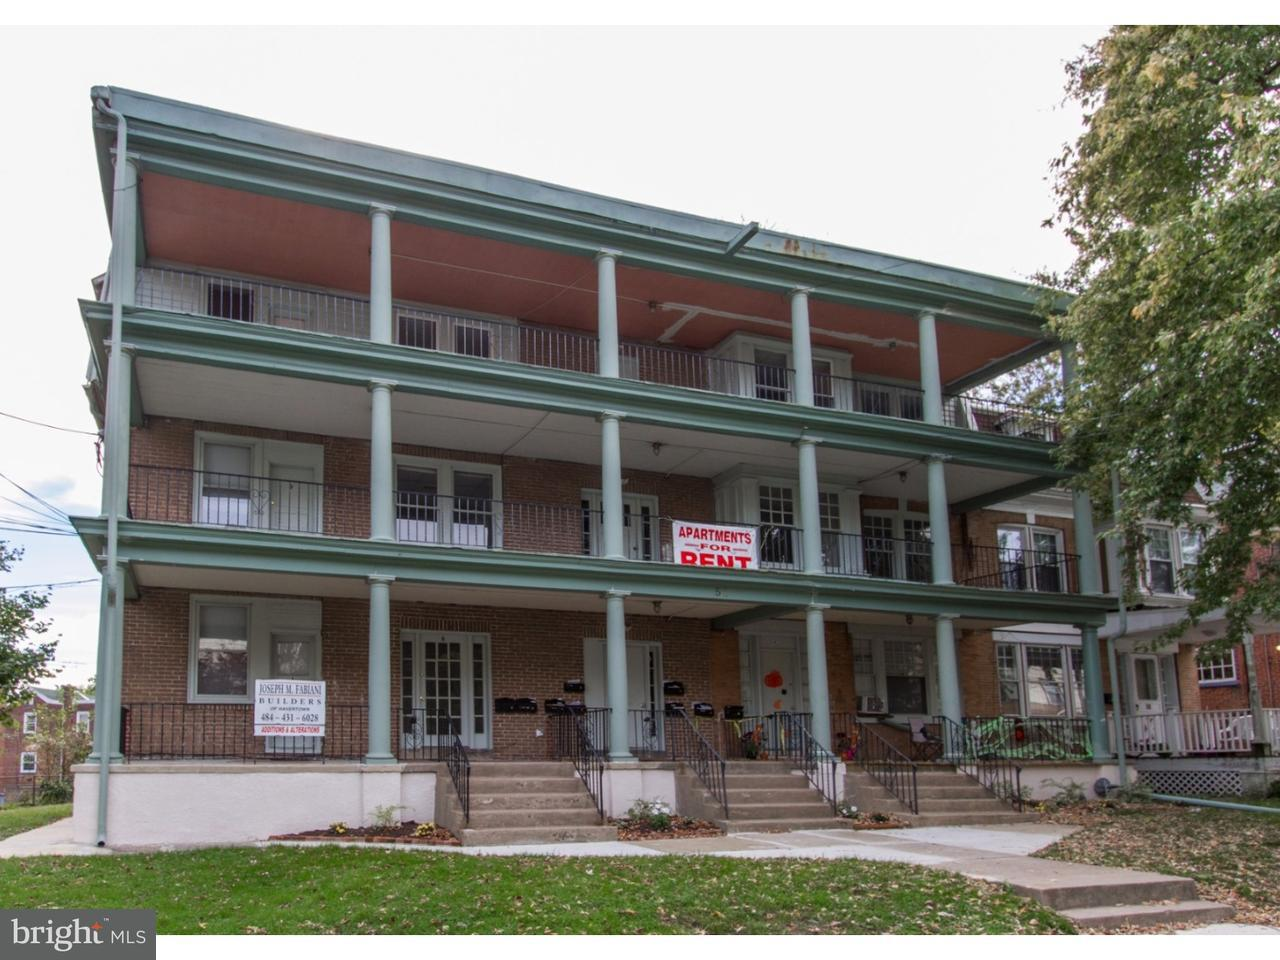 "Single Family Home for Rent at 52-54 E STRATFORD AVE #""I"" Lansdowne, Pennsylvania 19050 United States"